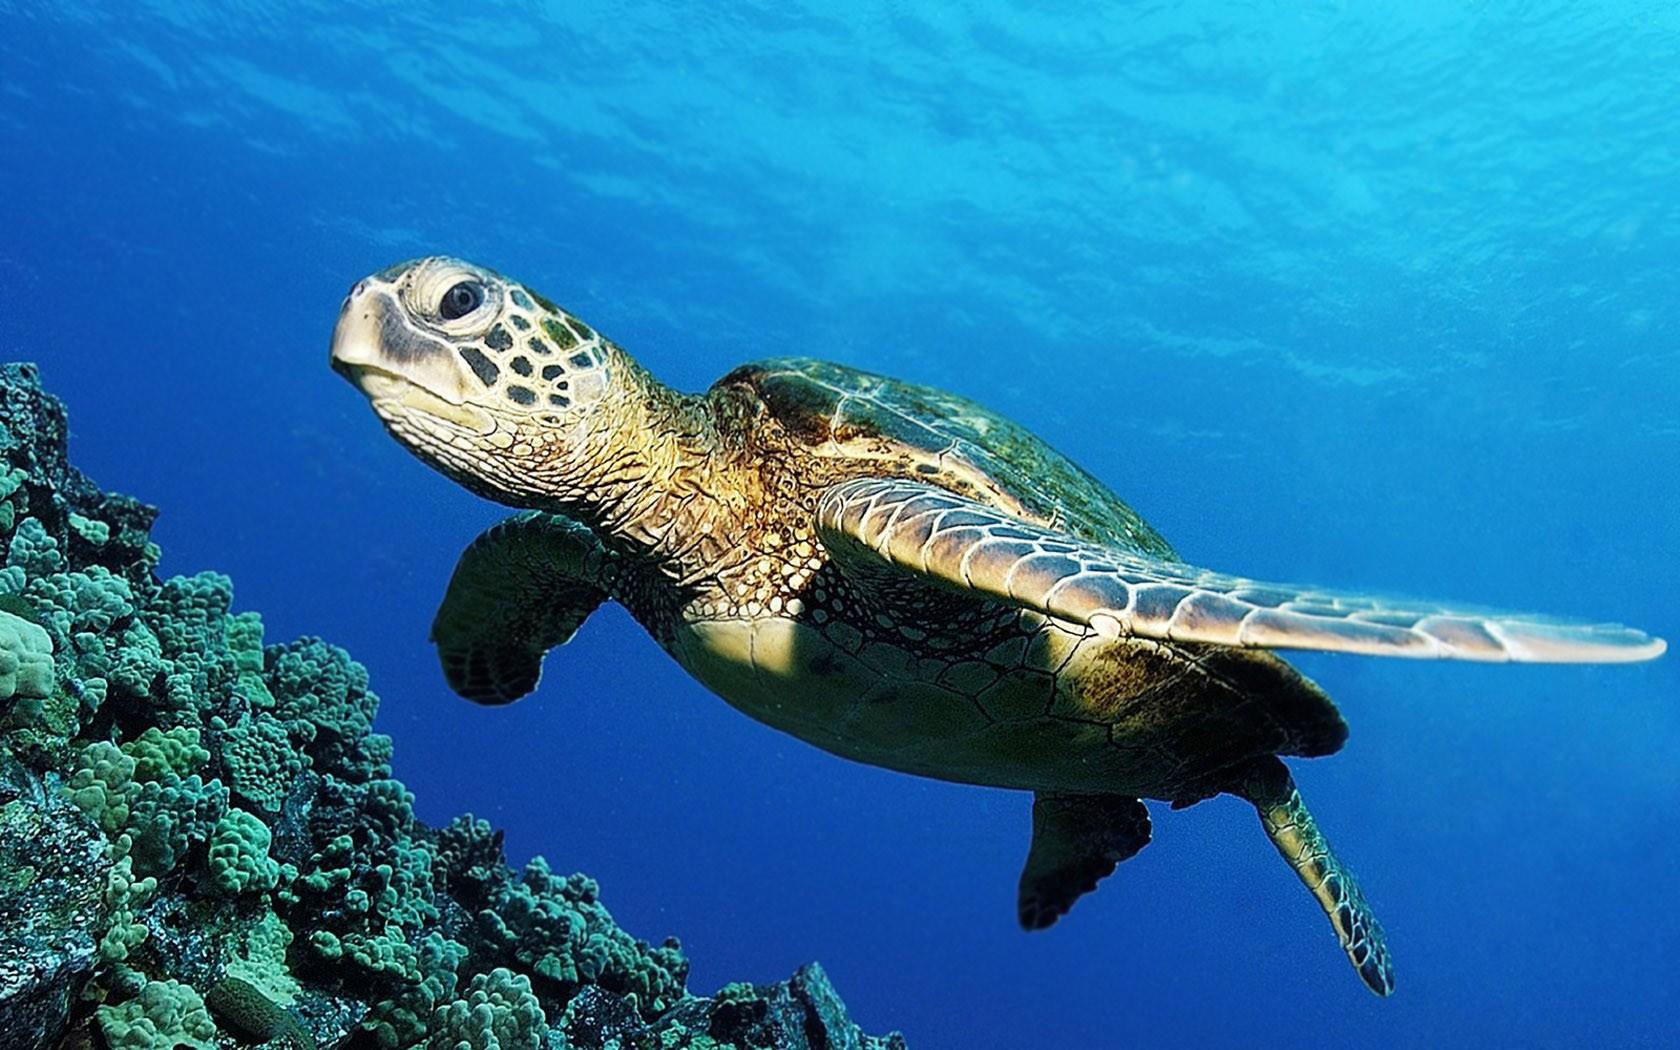 Una tortuga en el mar - 1680x1050